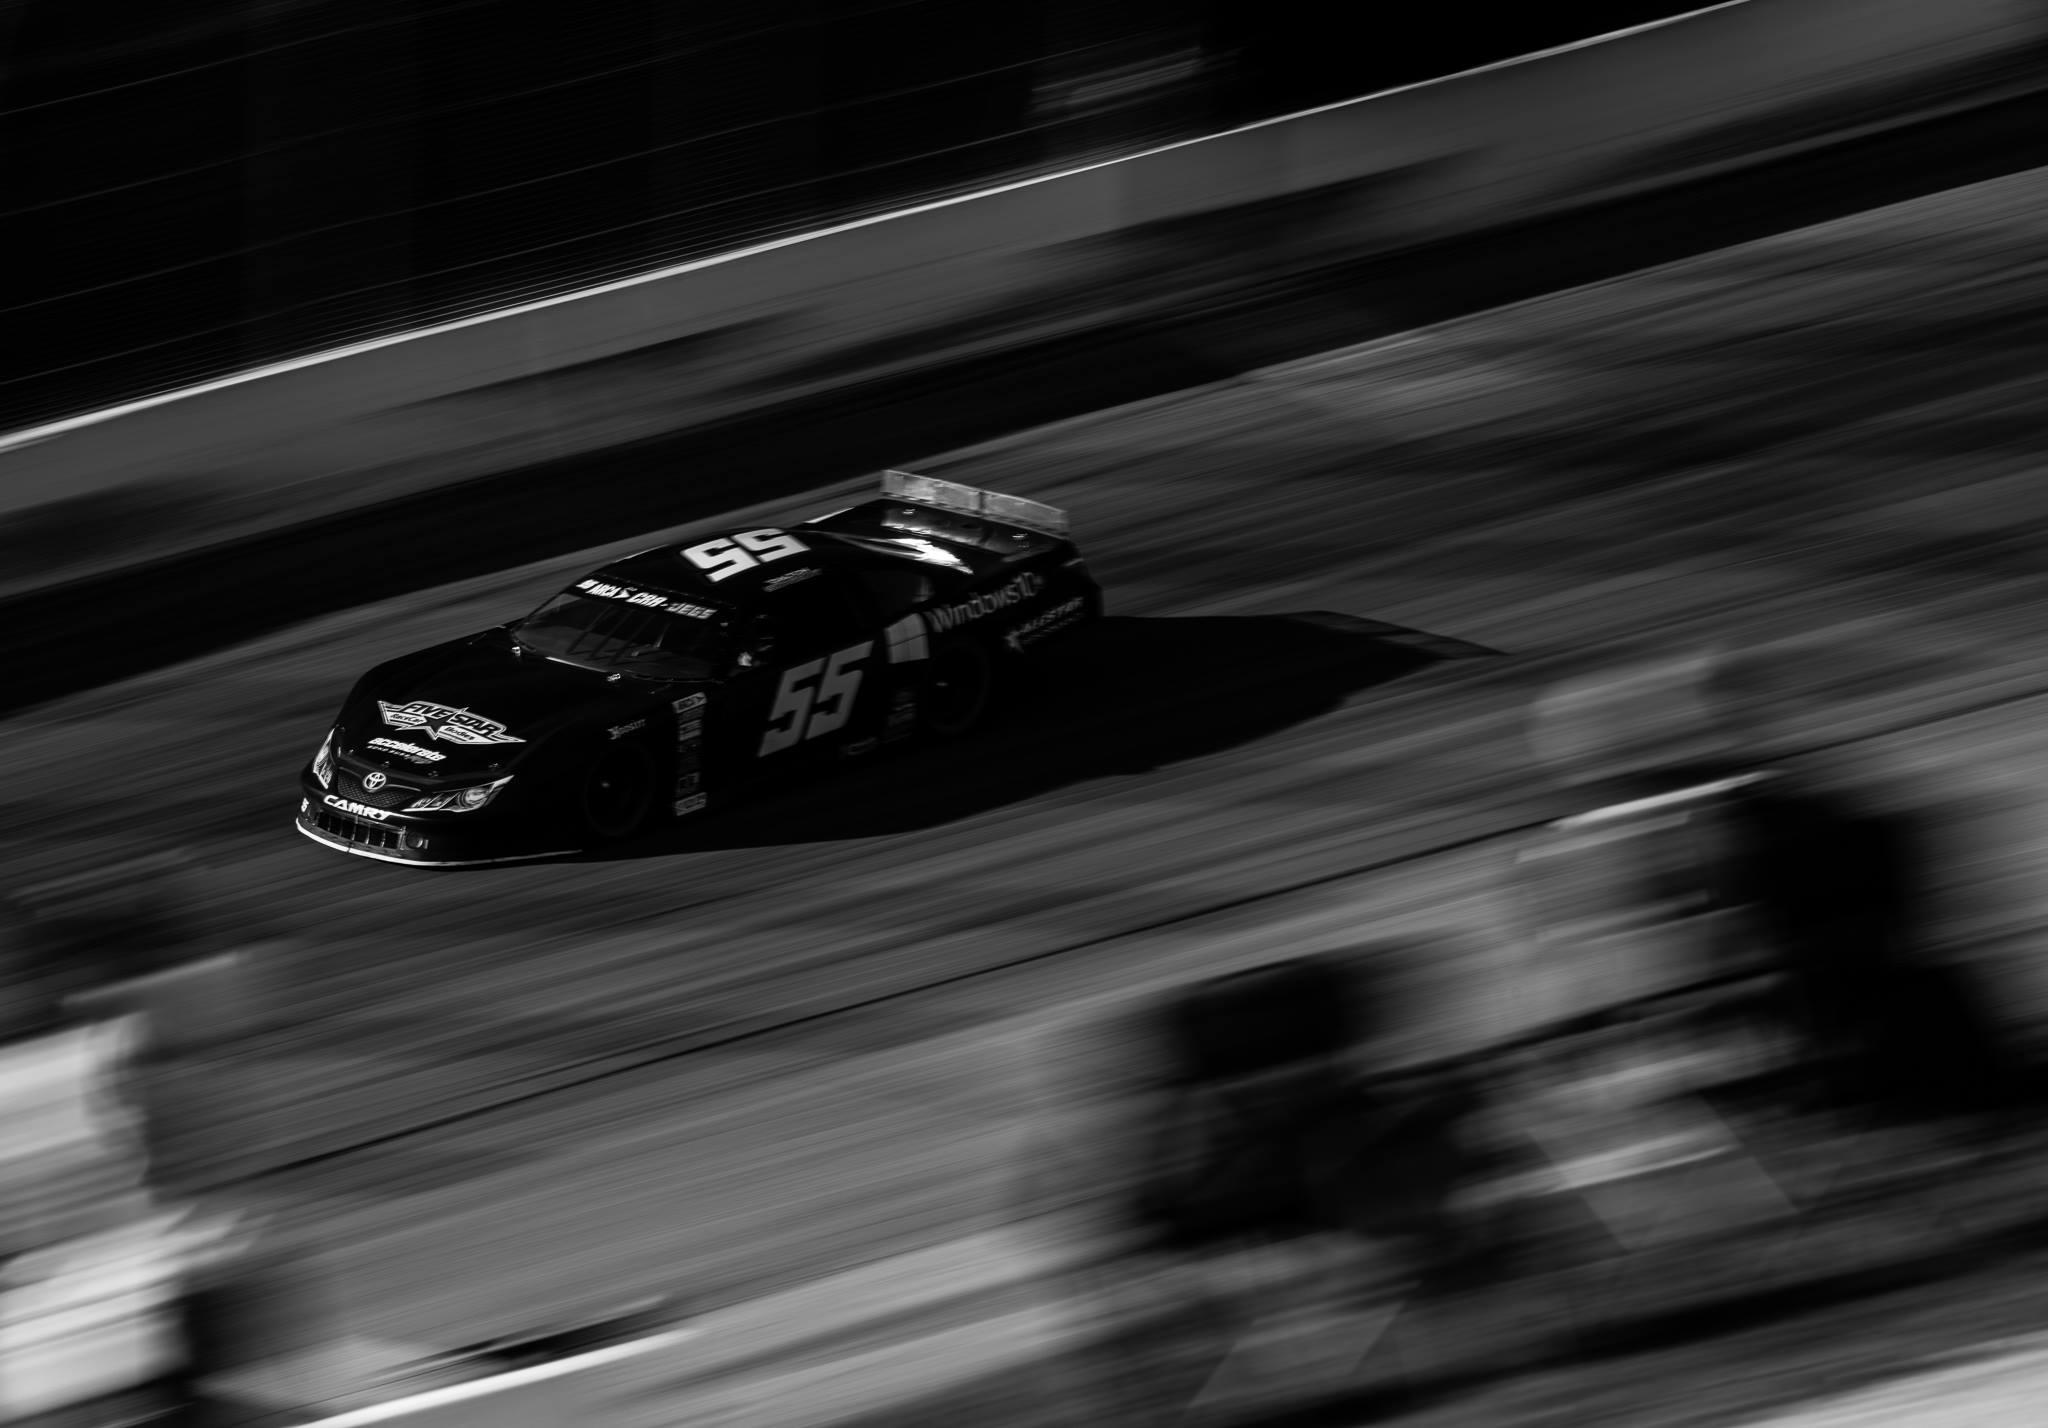 Dalton Sargeant 2017 Ride with Cunningham Motorsports - Windows 10 Racecar